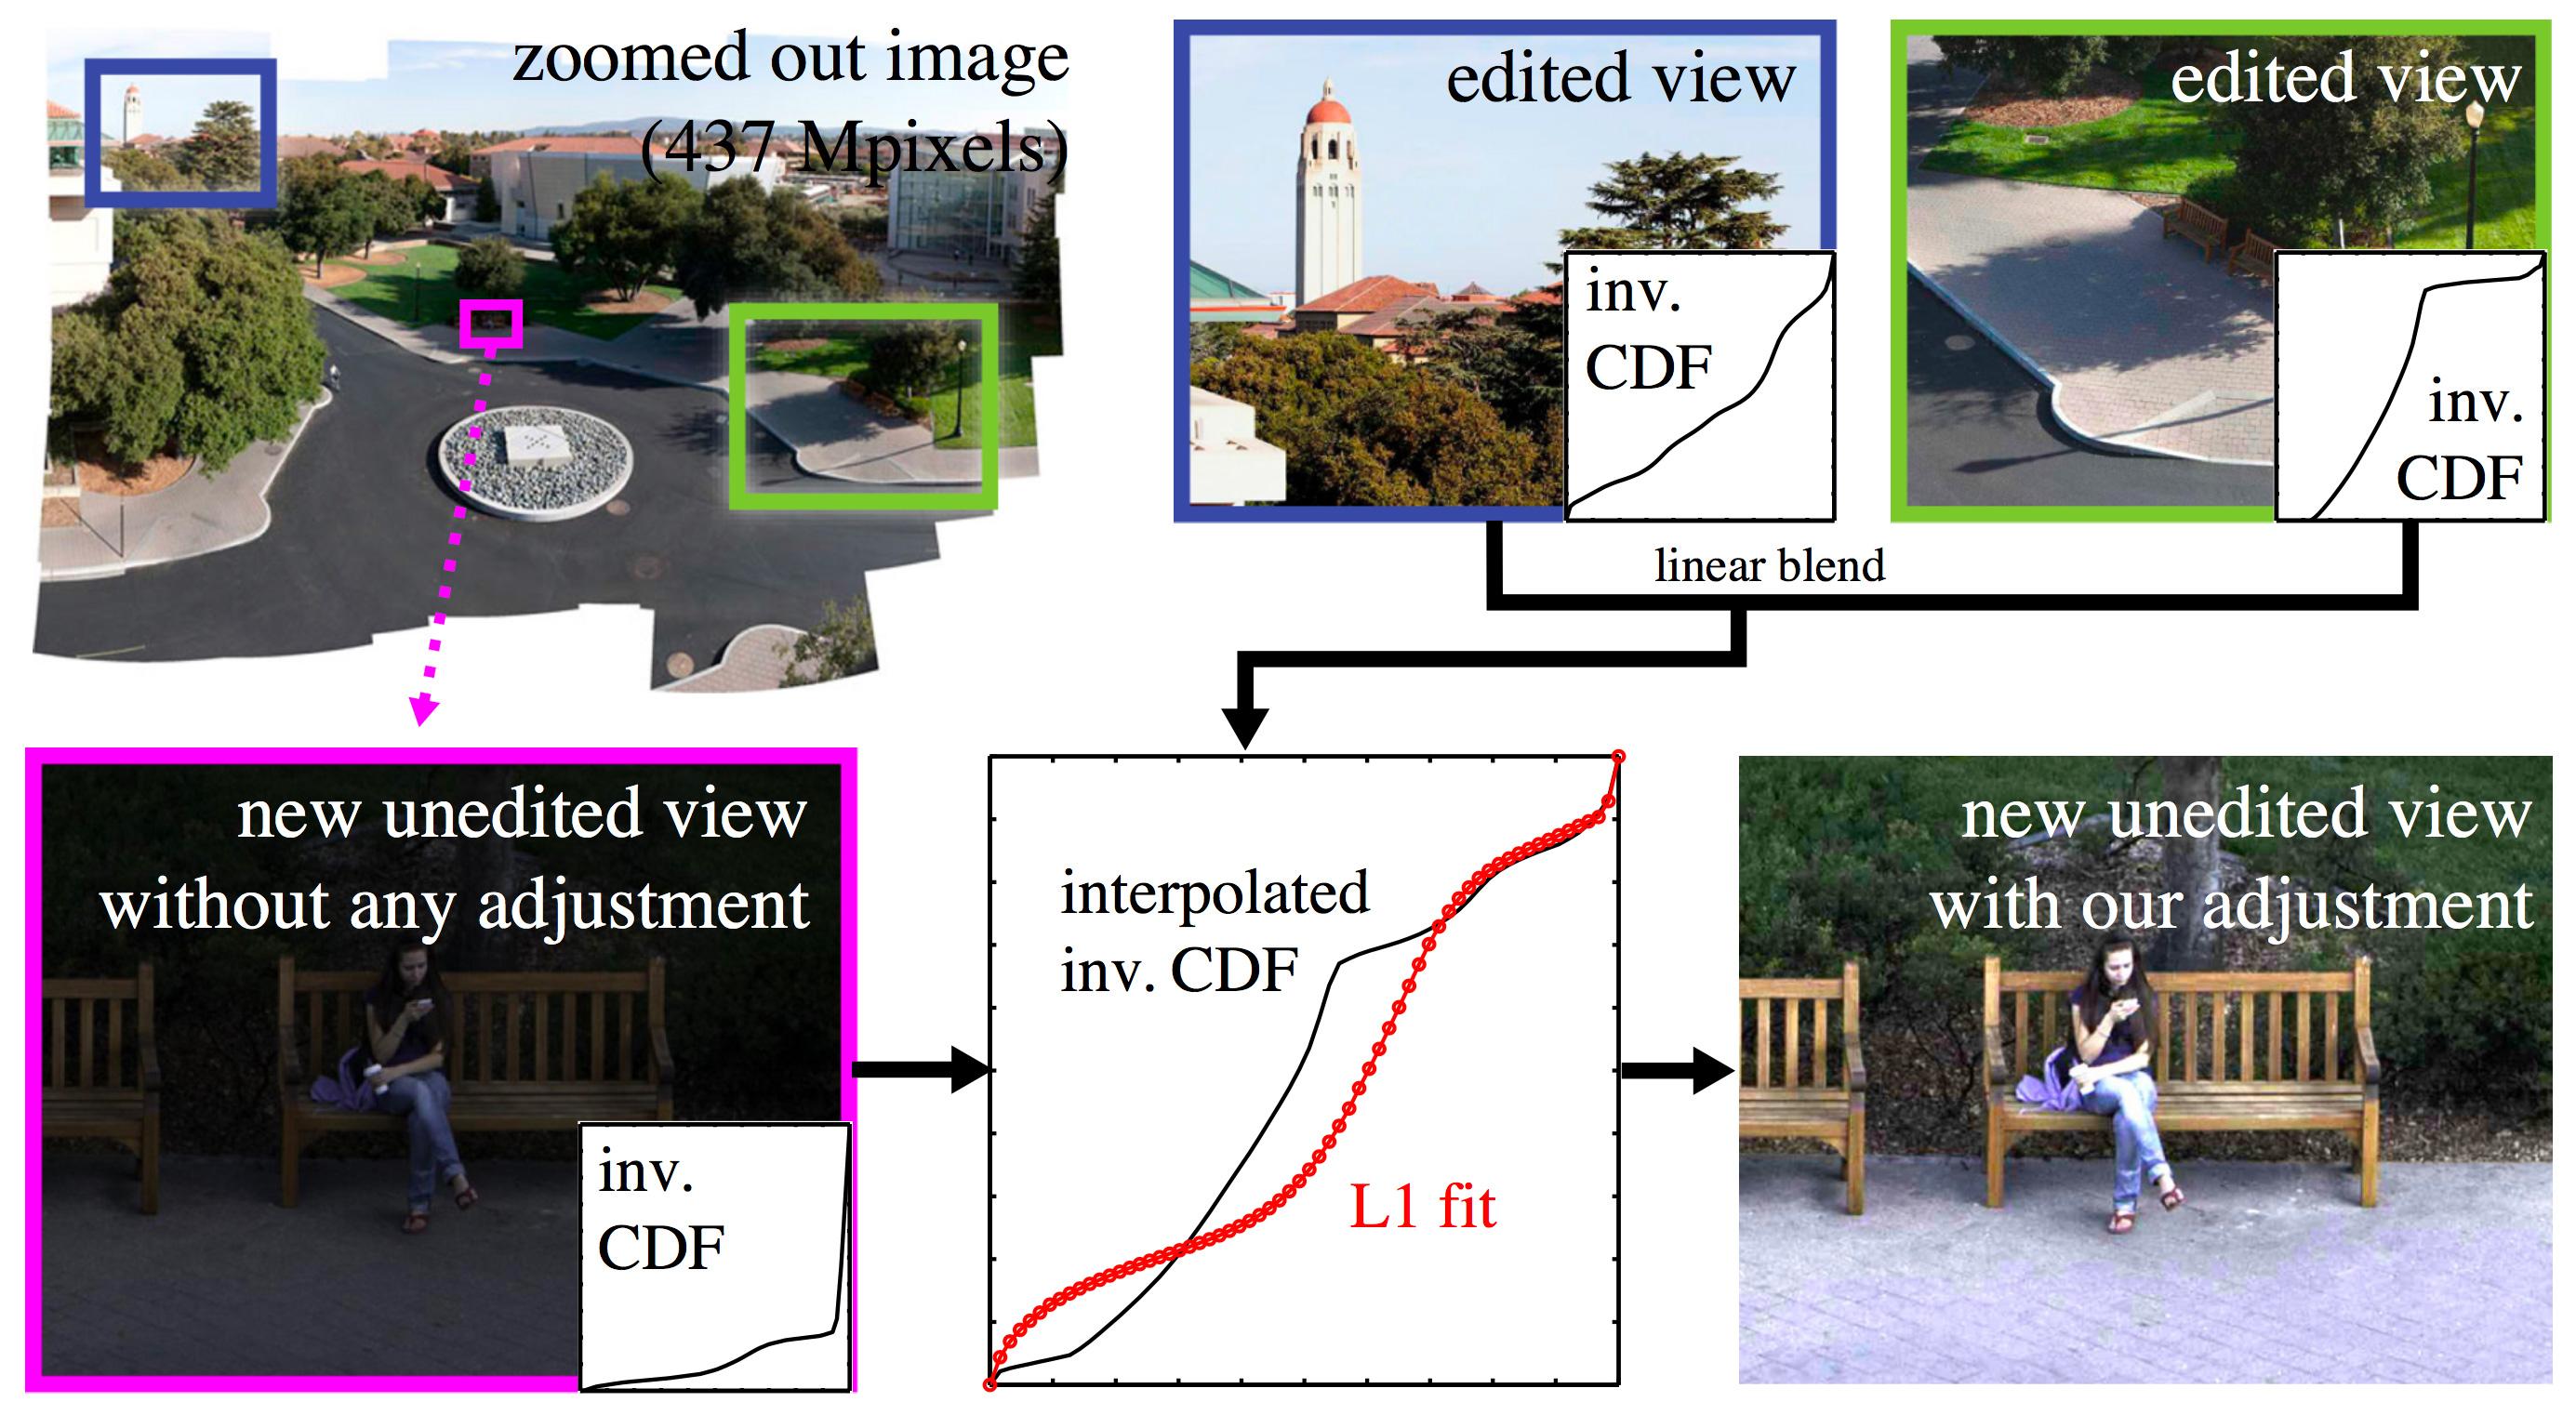 Display-aware Image Editing